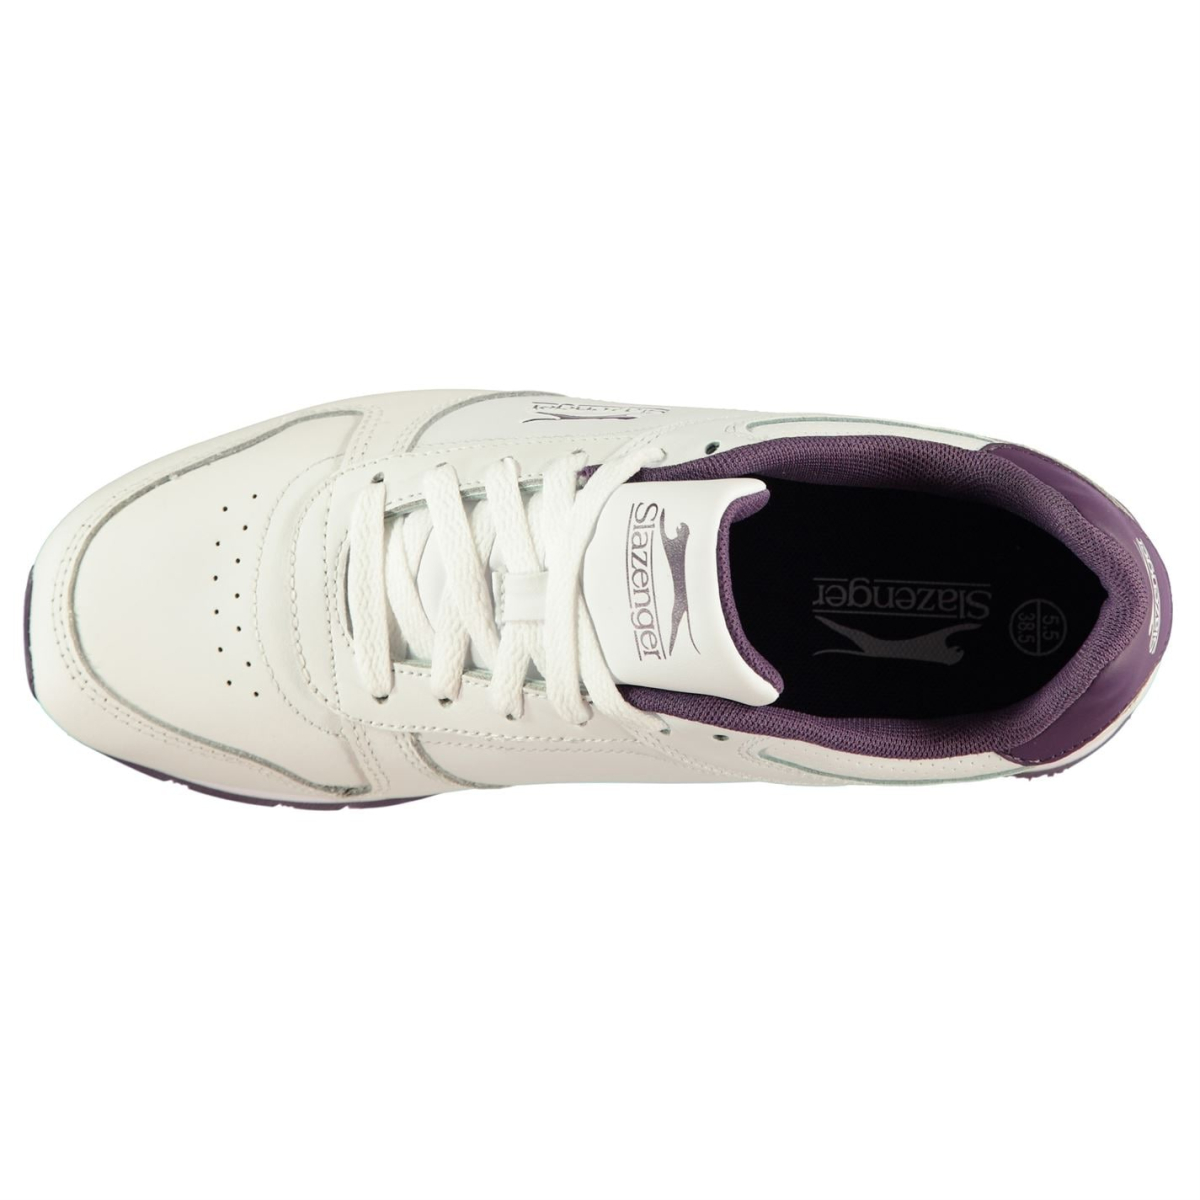 Slazenger-Classic-Turnschuhe-Laufschuhe-Damen-Sportschuhe-Sneaker-1265 Indexbild 22